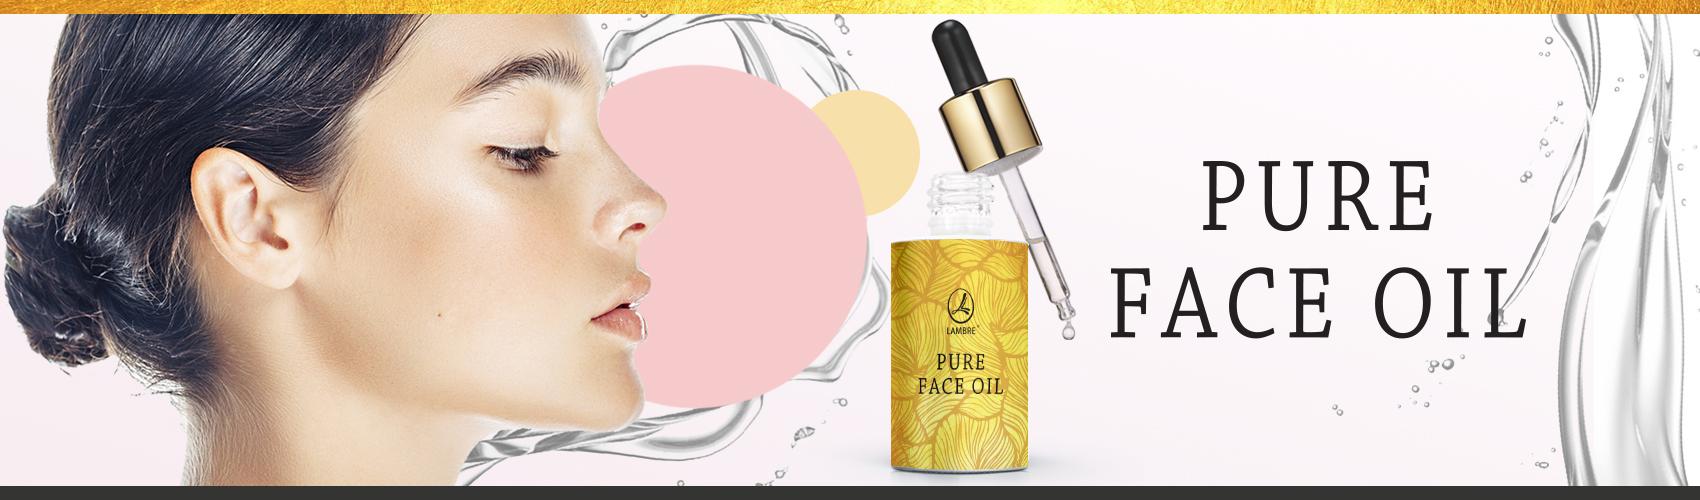 Новика !!! Омолаживающий крем для лица и шеи Pure Face Oil Lambre